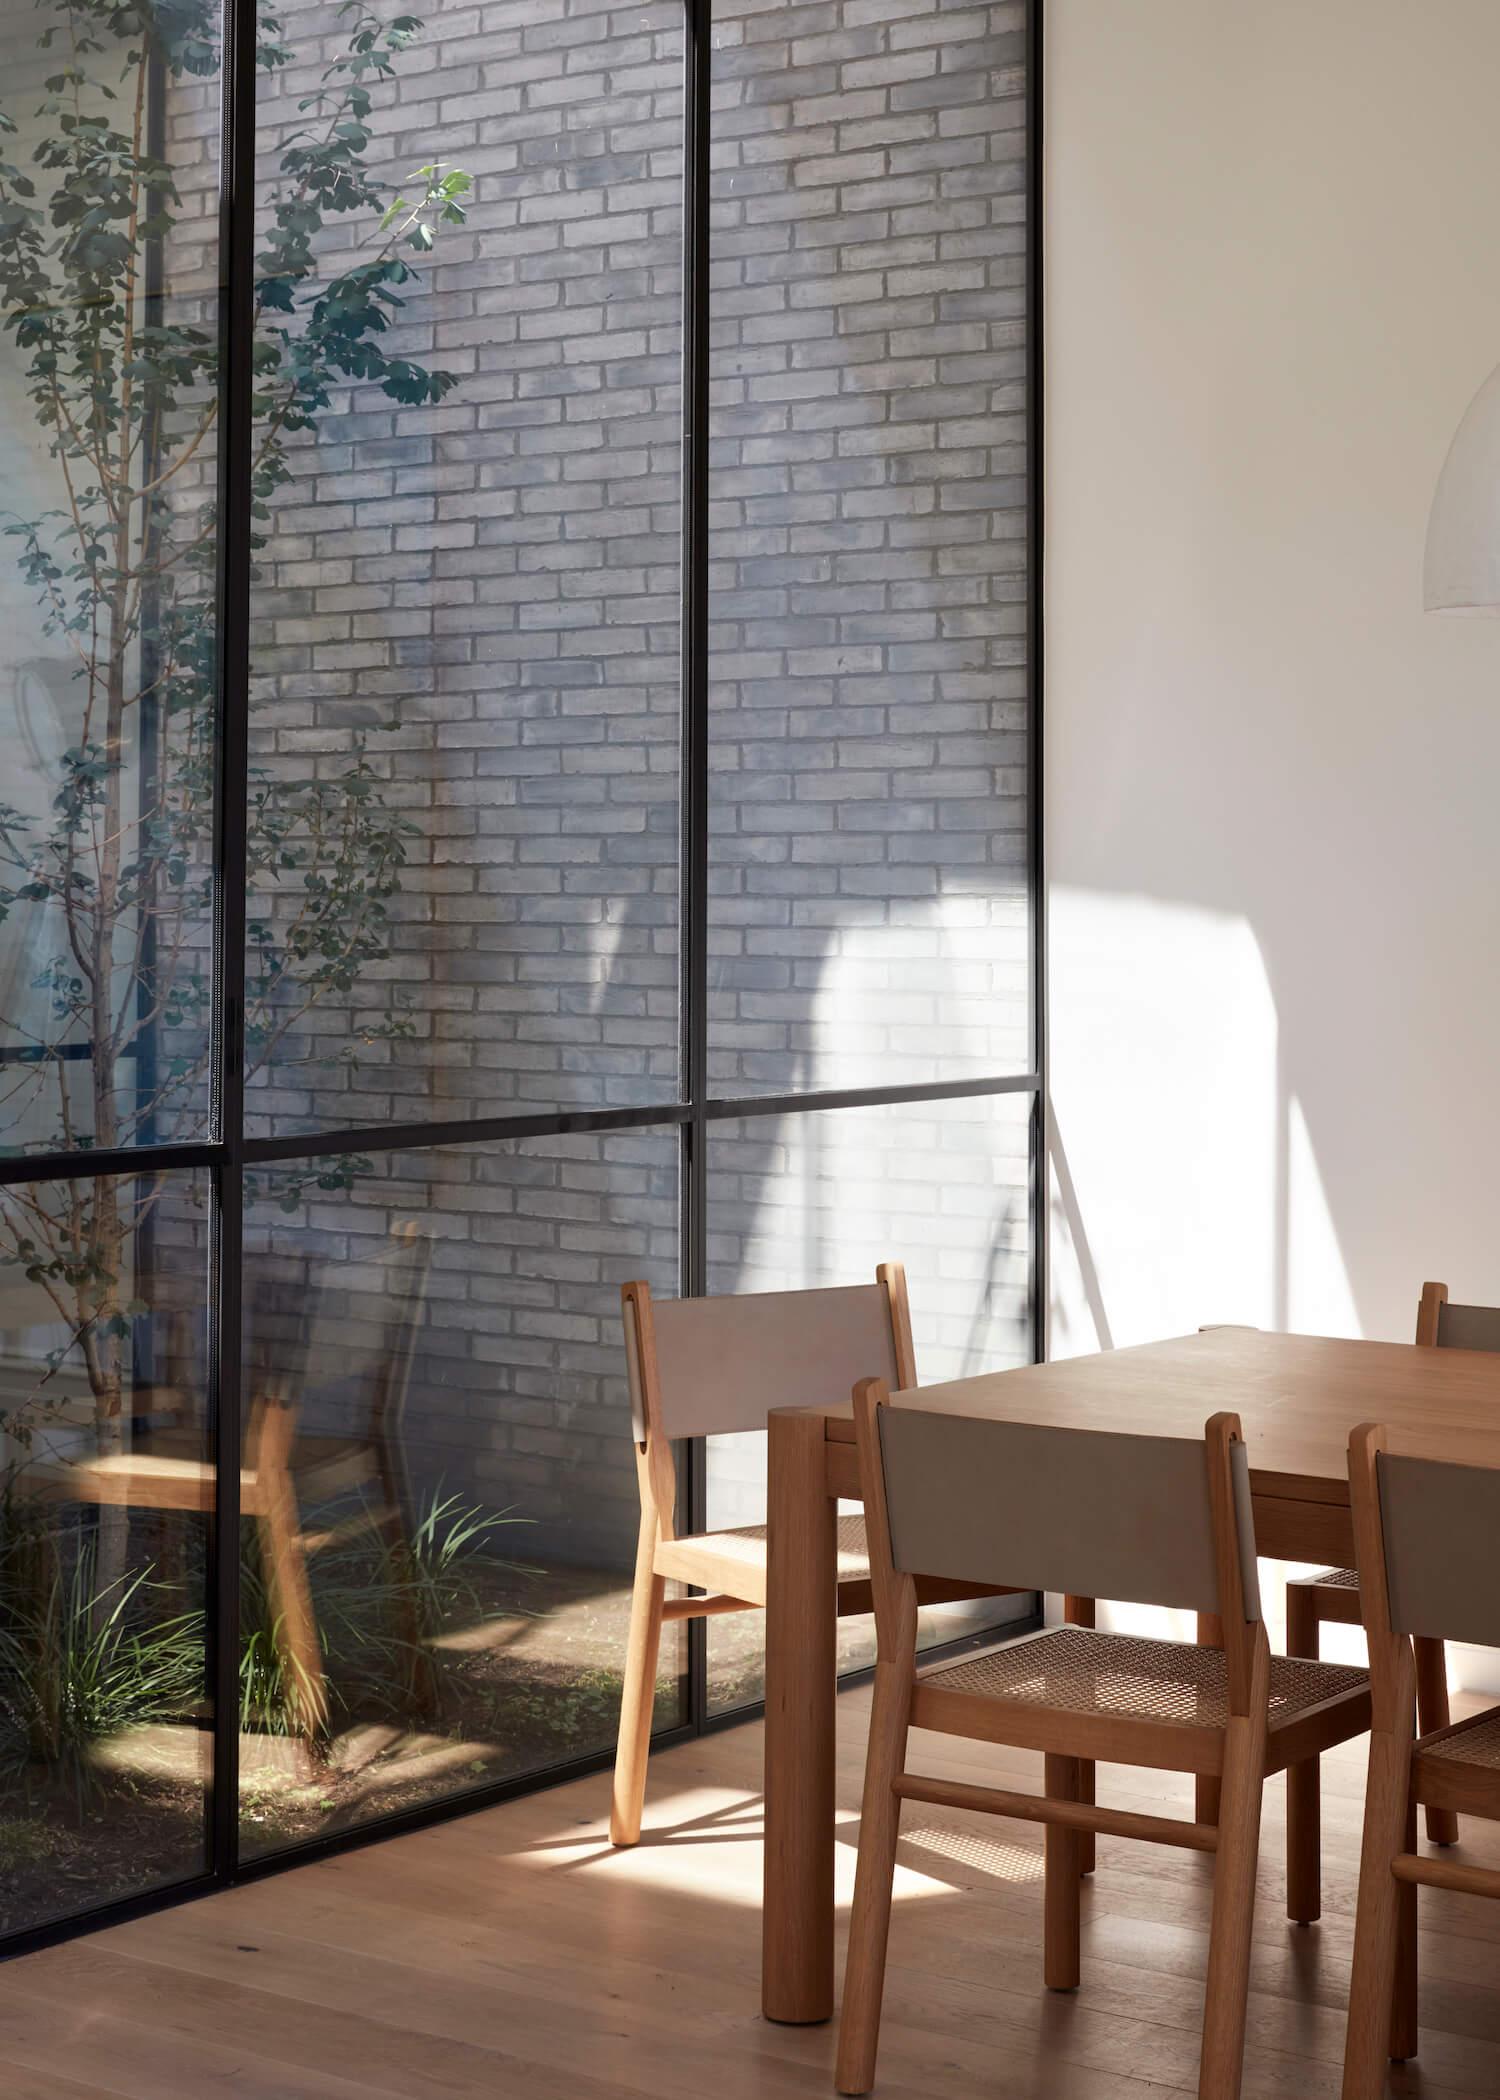 est living inglis architects northcote house 13